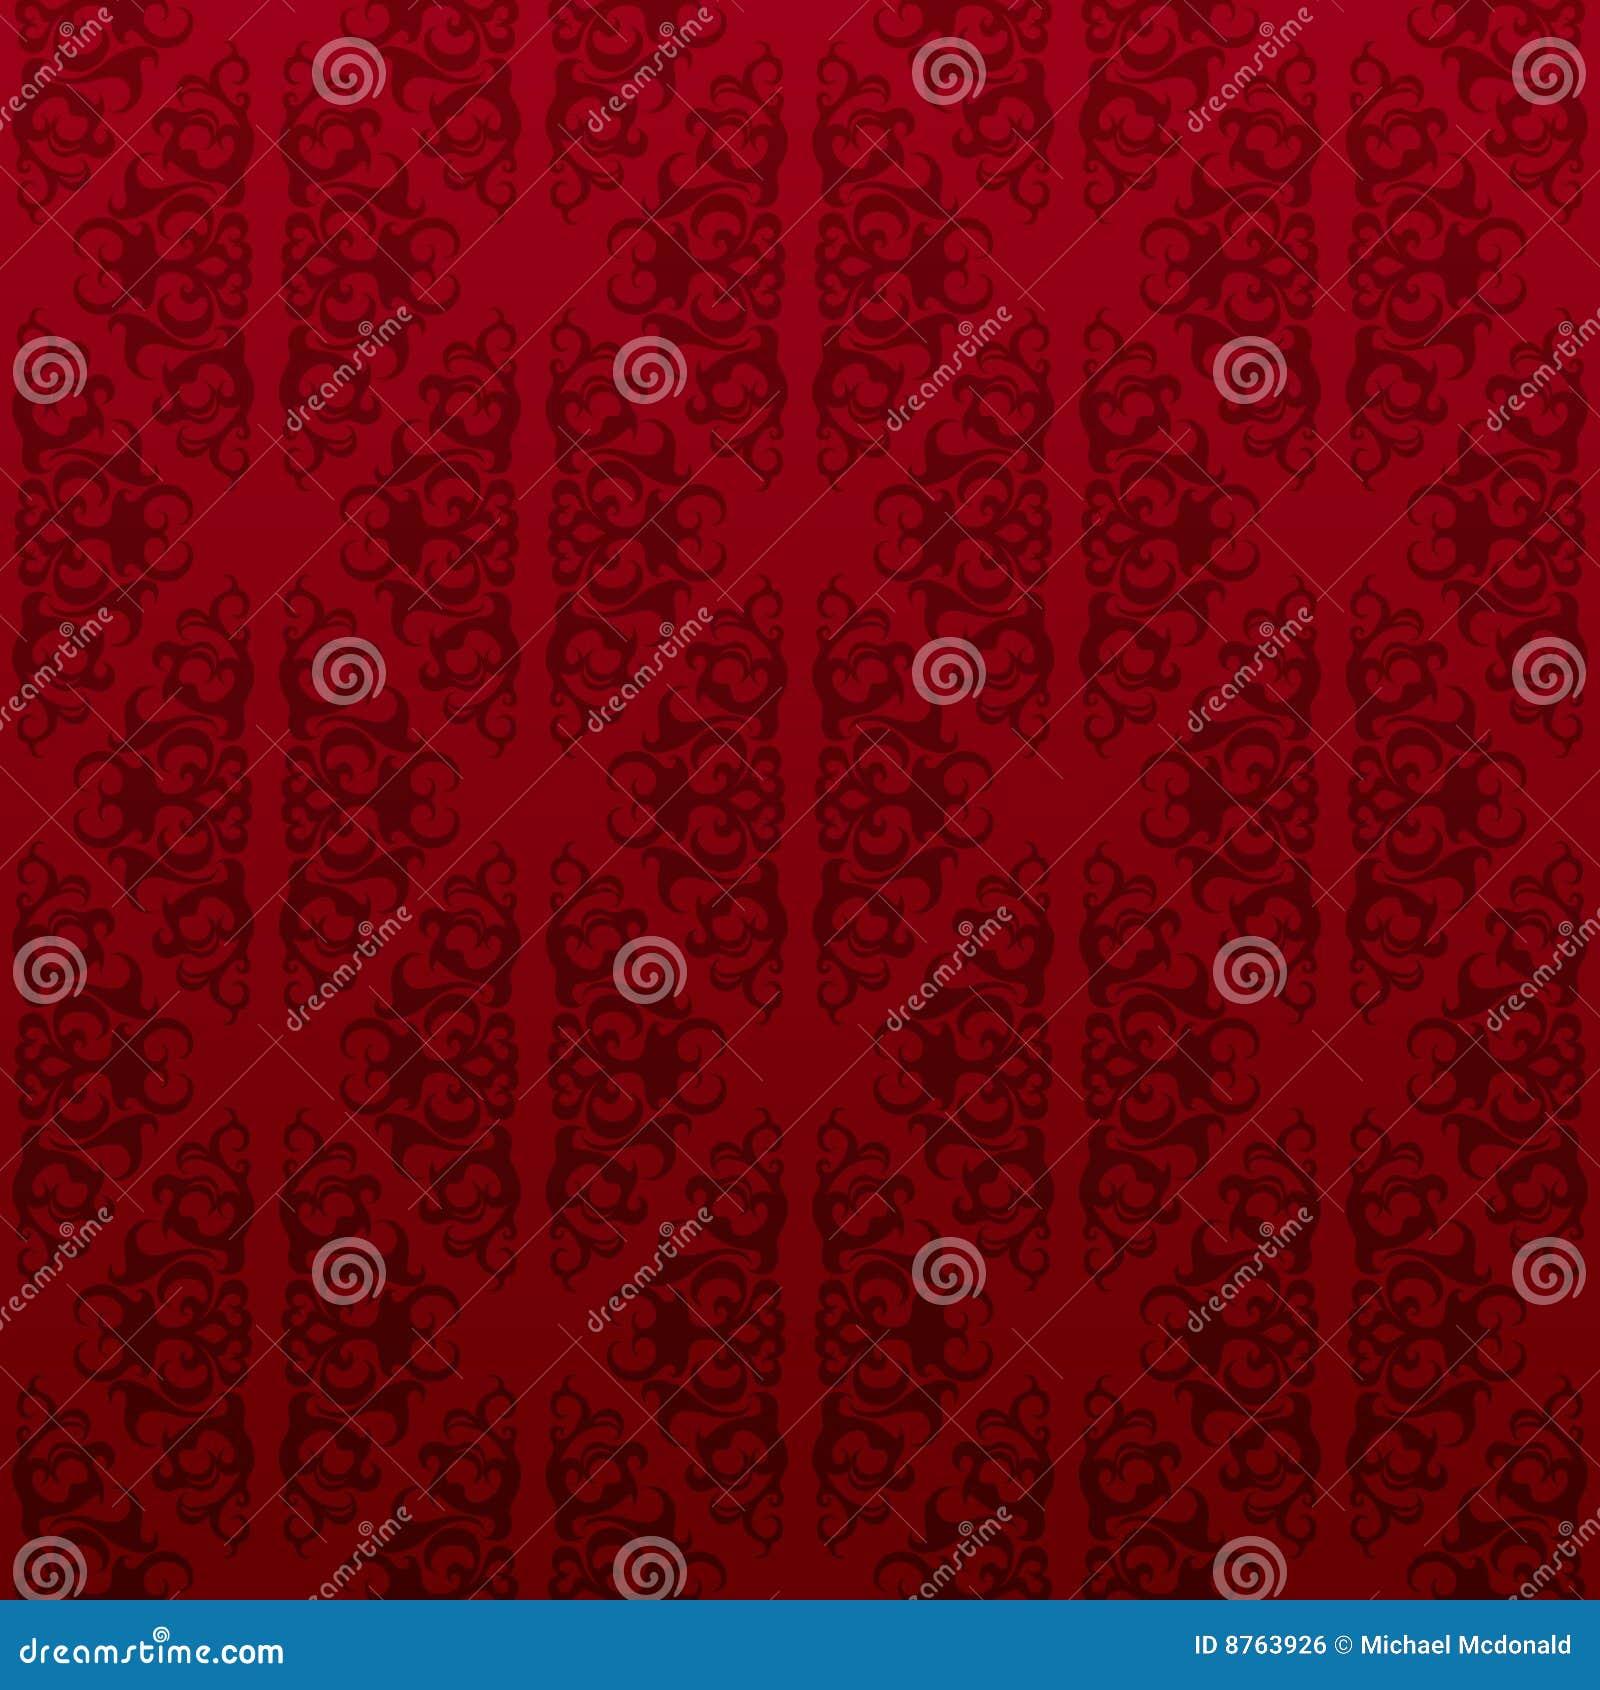 Red seamless vine wallpaper